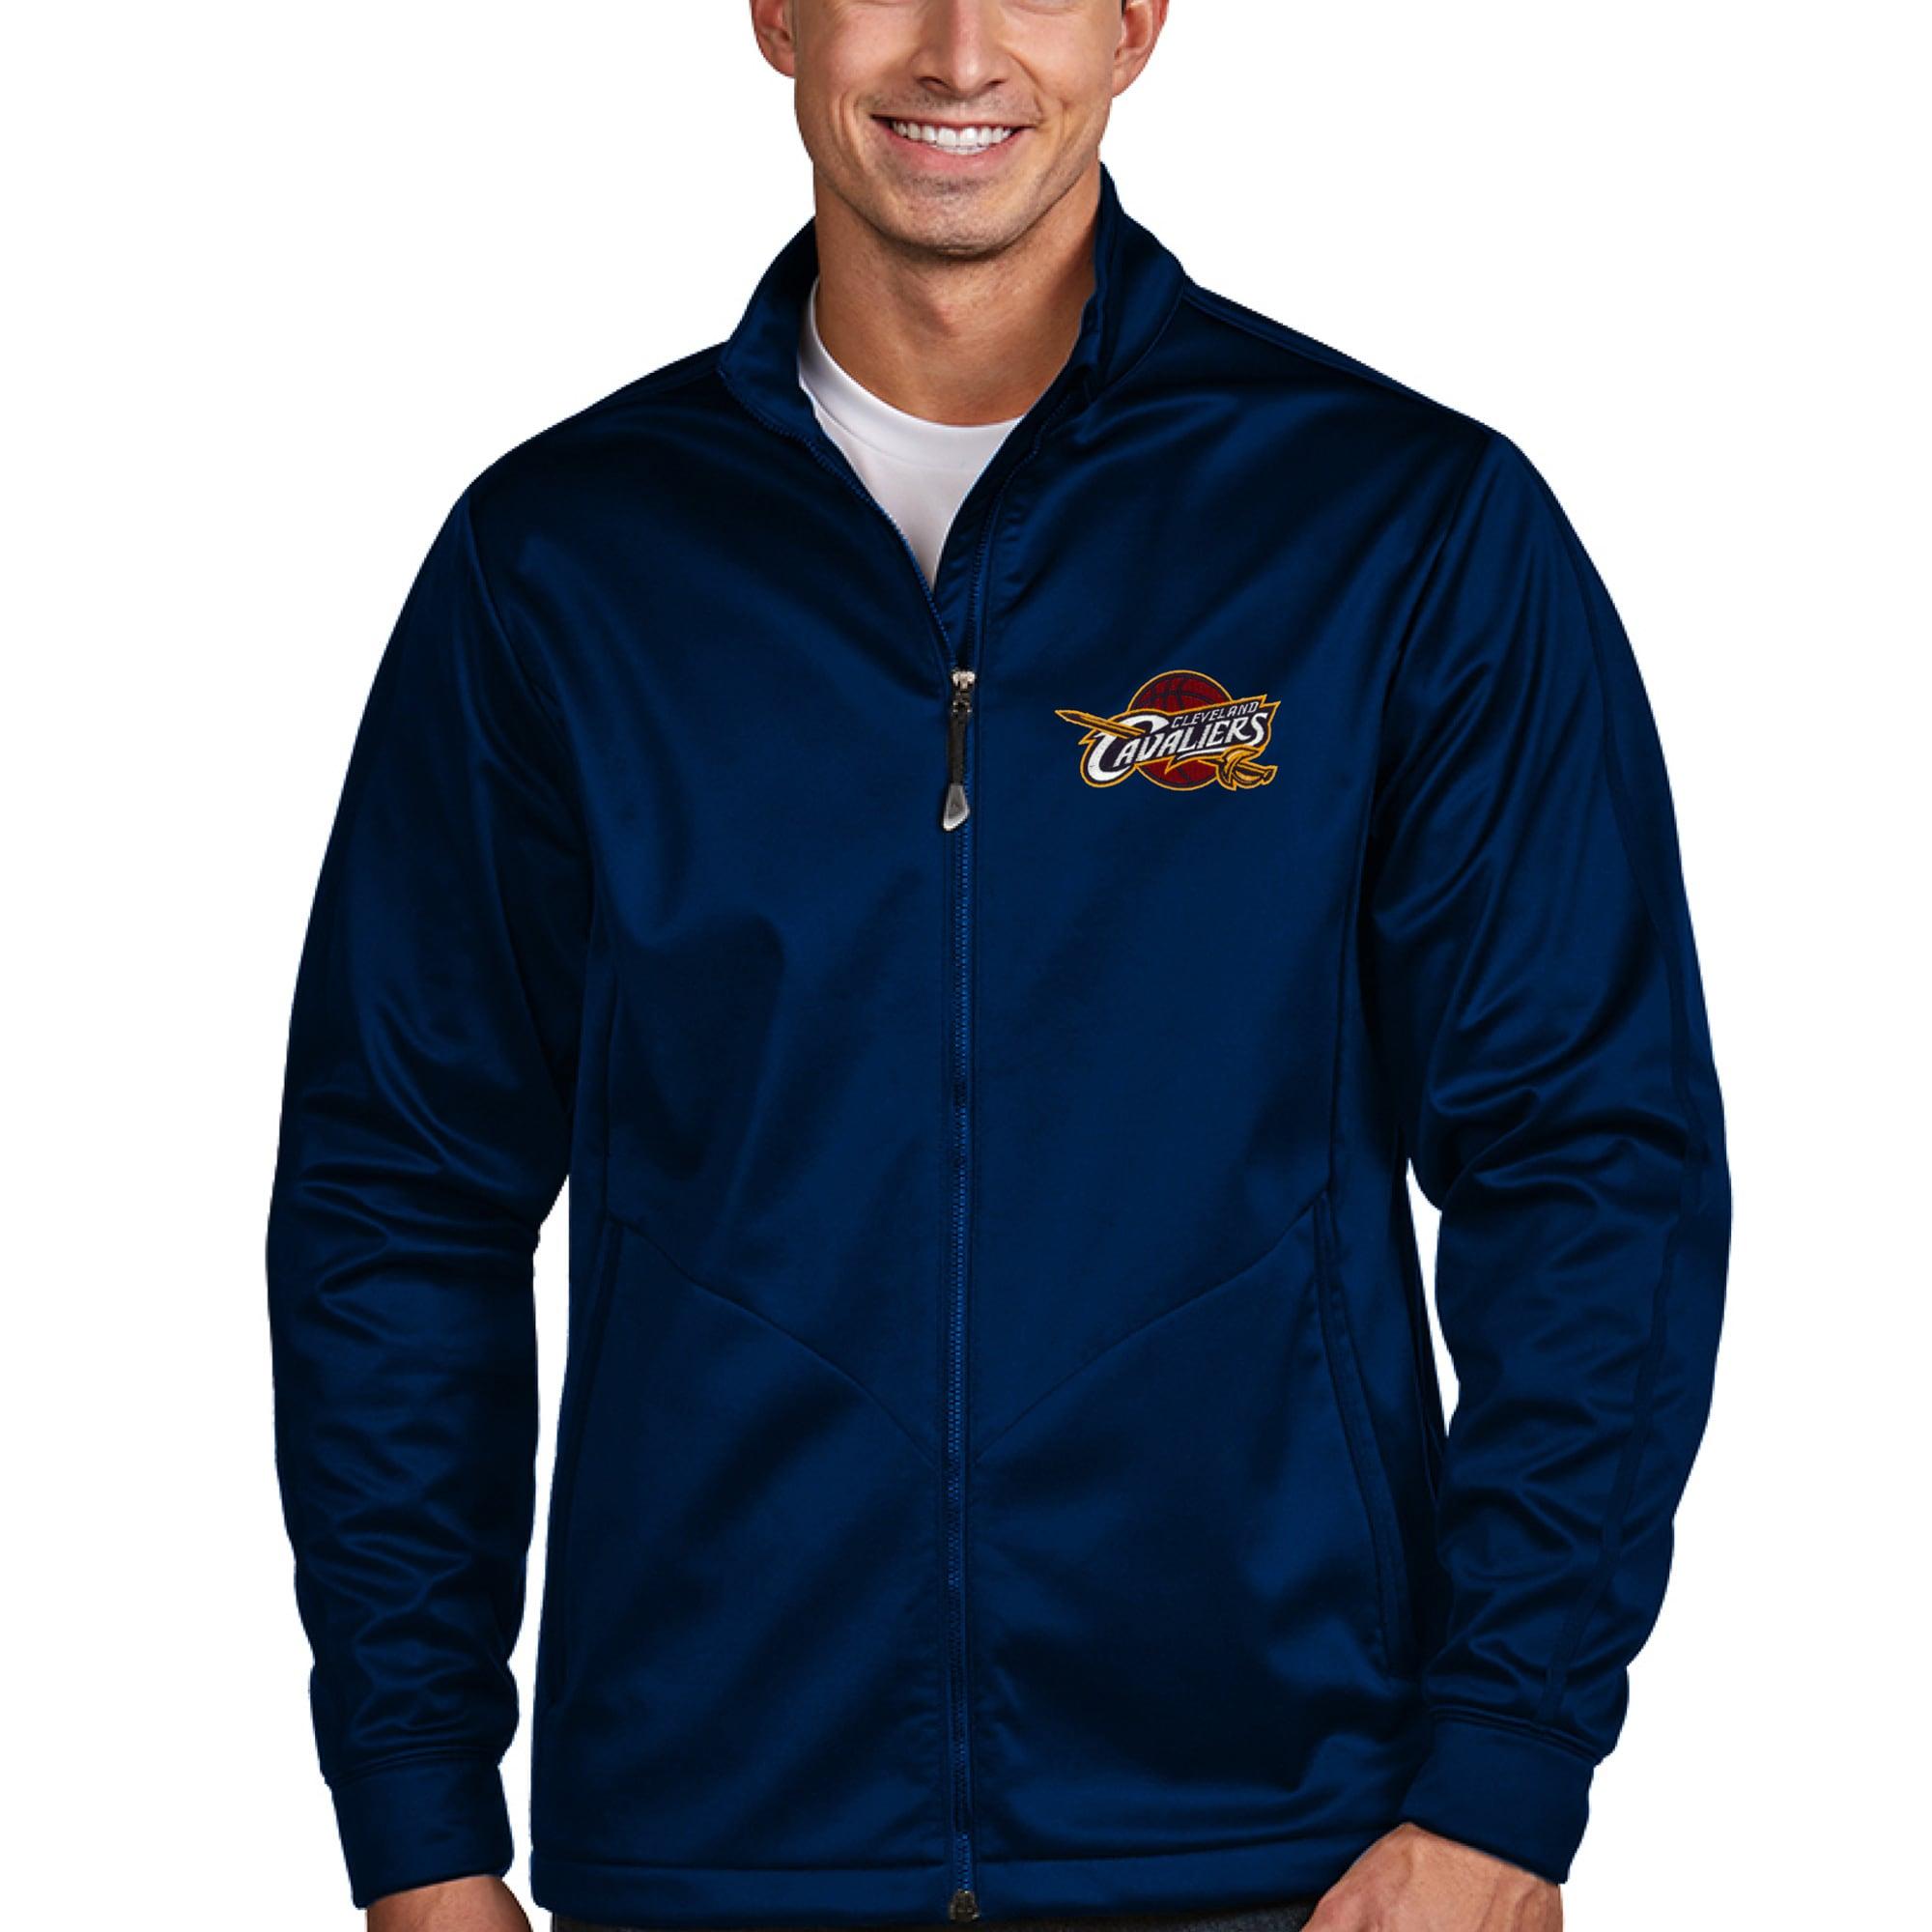 Cleveland Cavaliers Antigua Golf Full-Zip Jacket - Navy